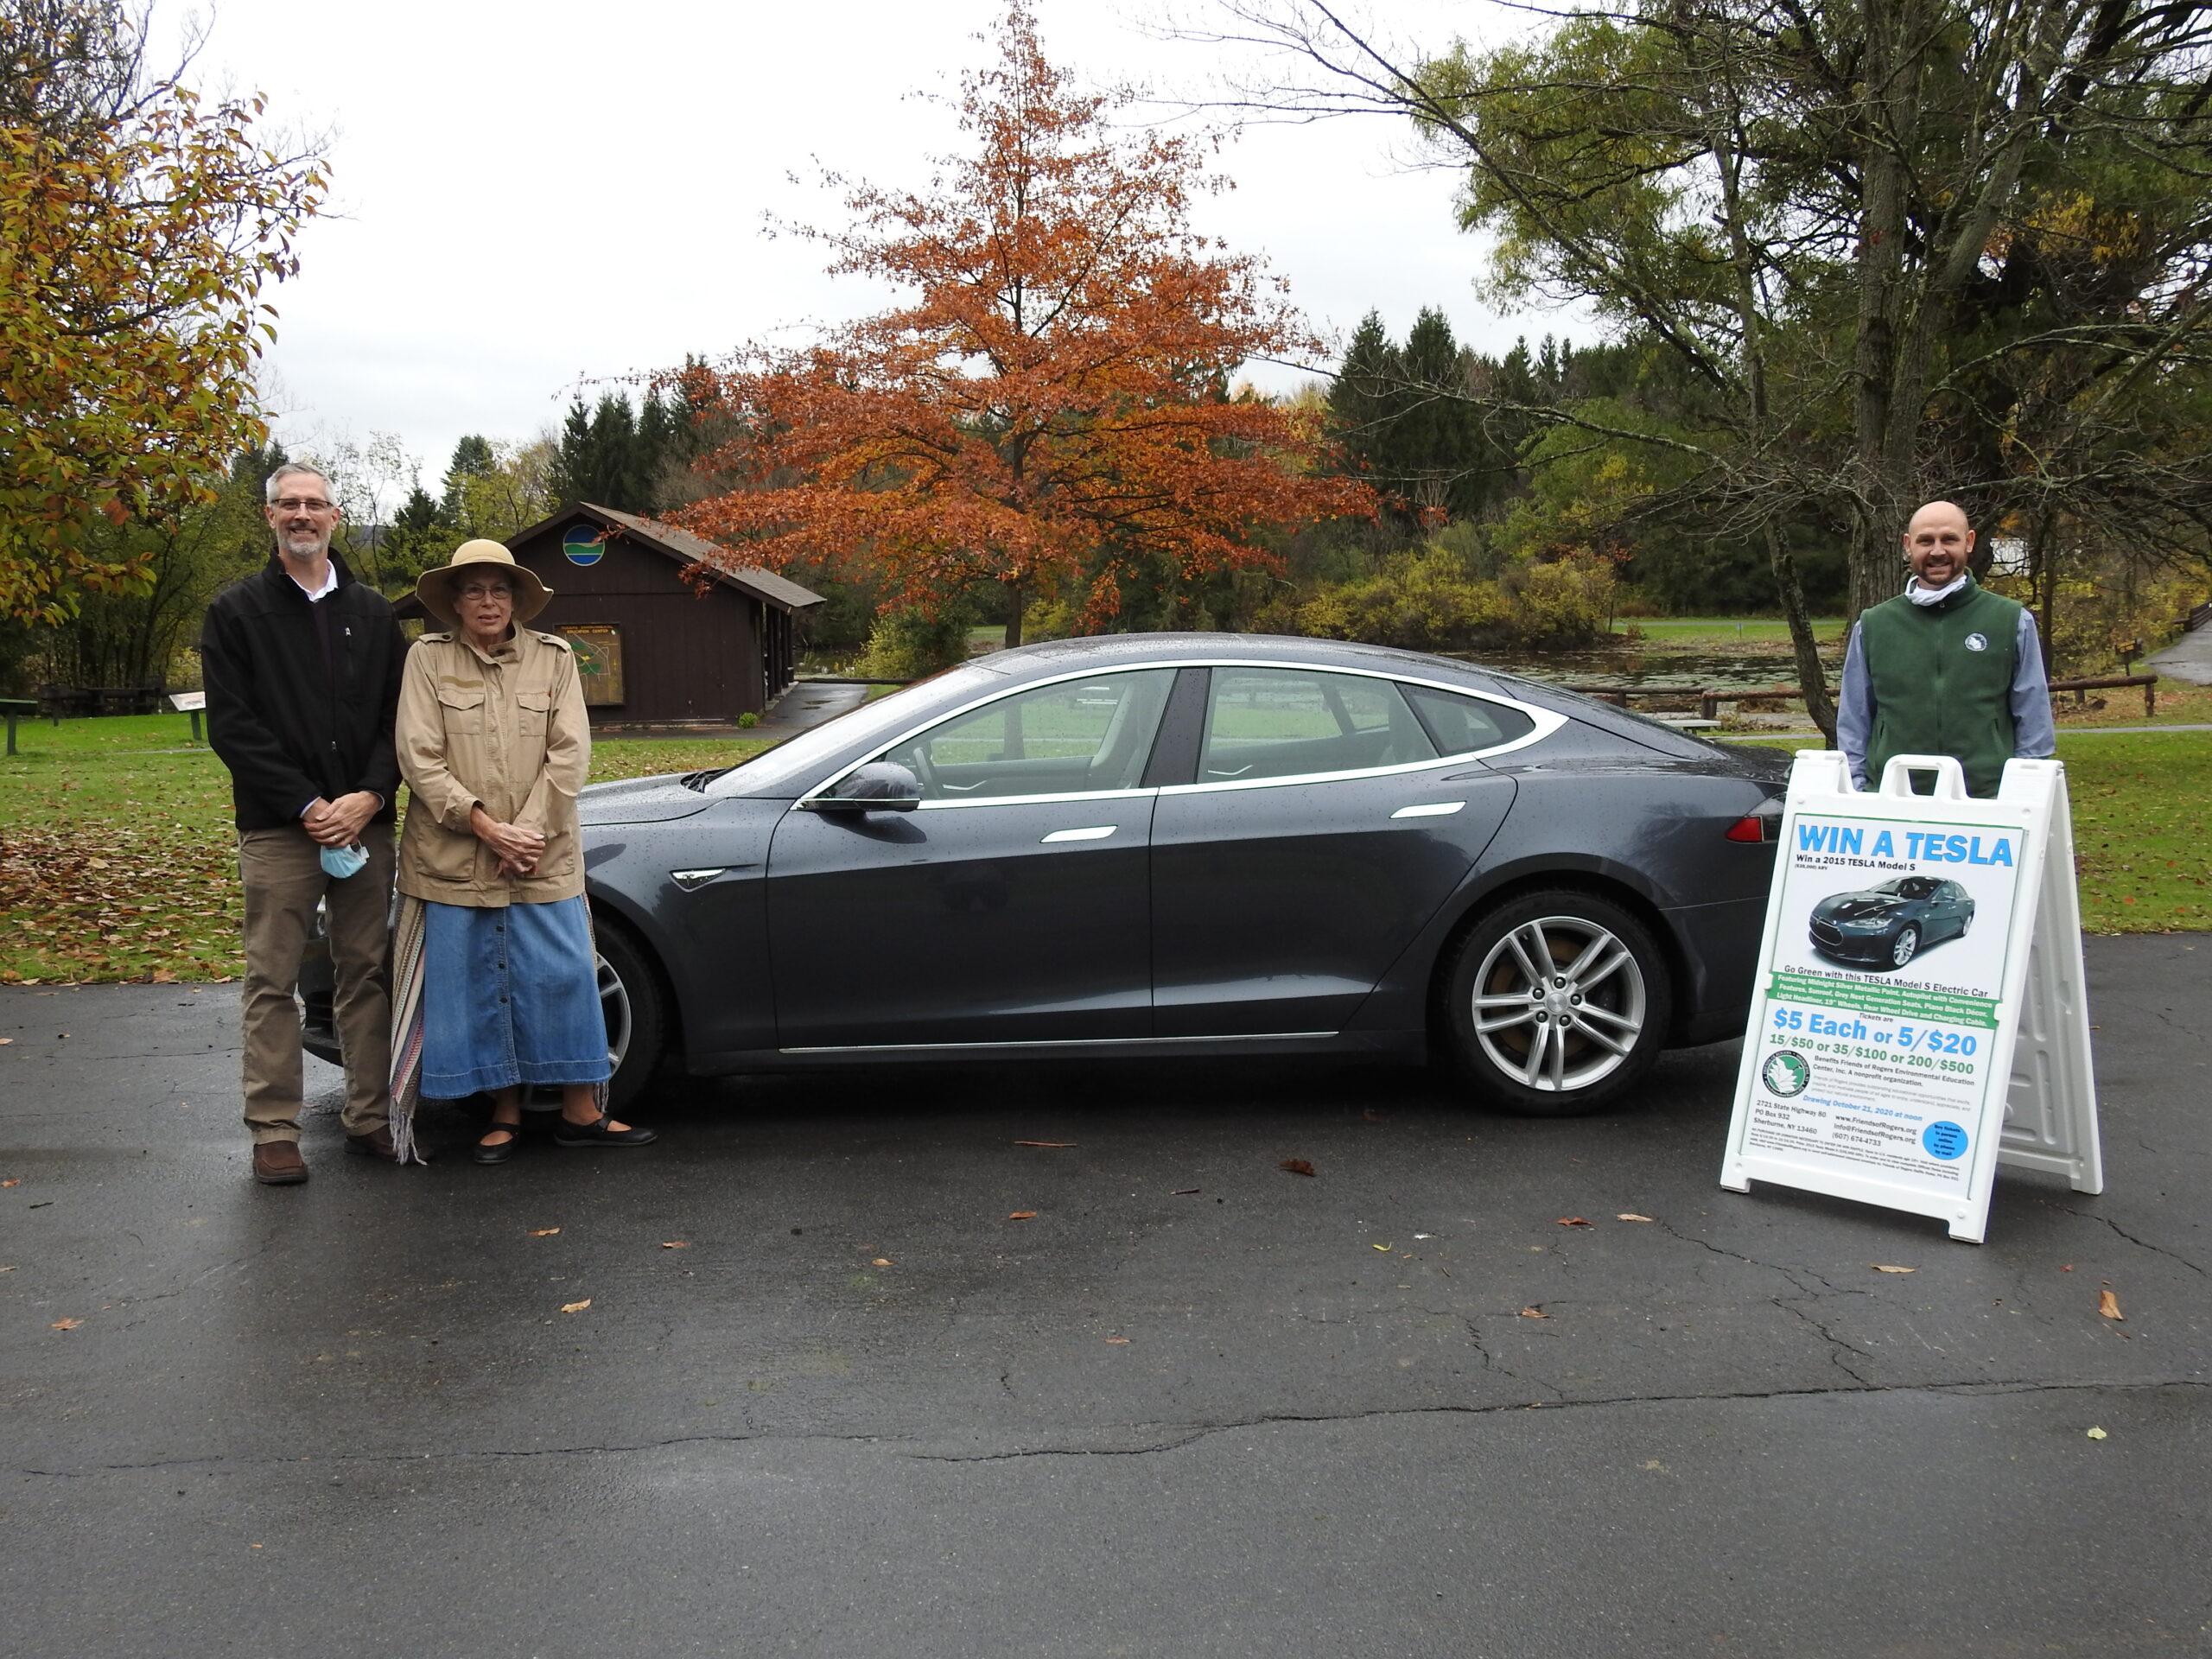 The Winner of the Tesla is Virginia Huerfeld of Glenmont, NY.